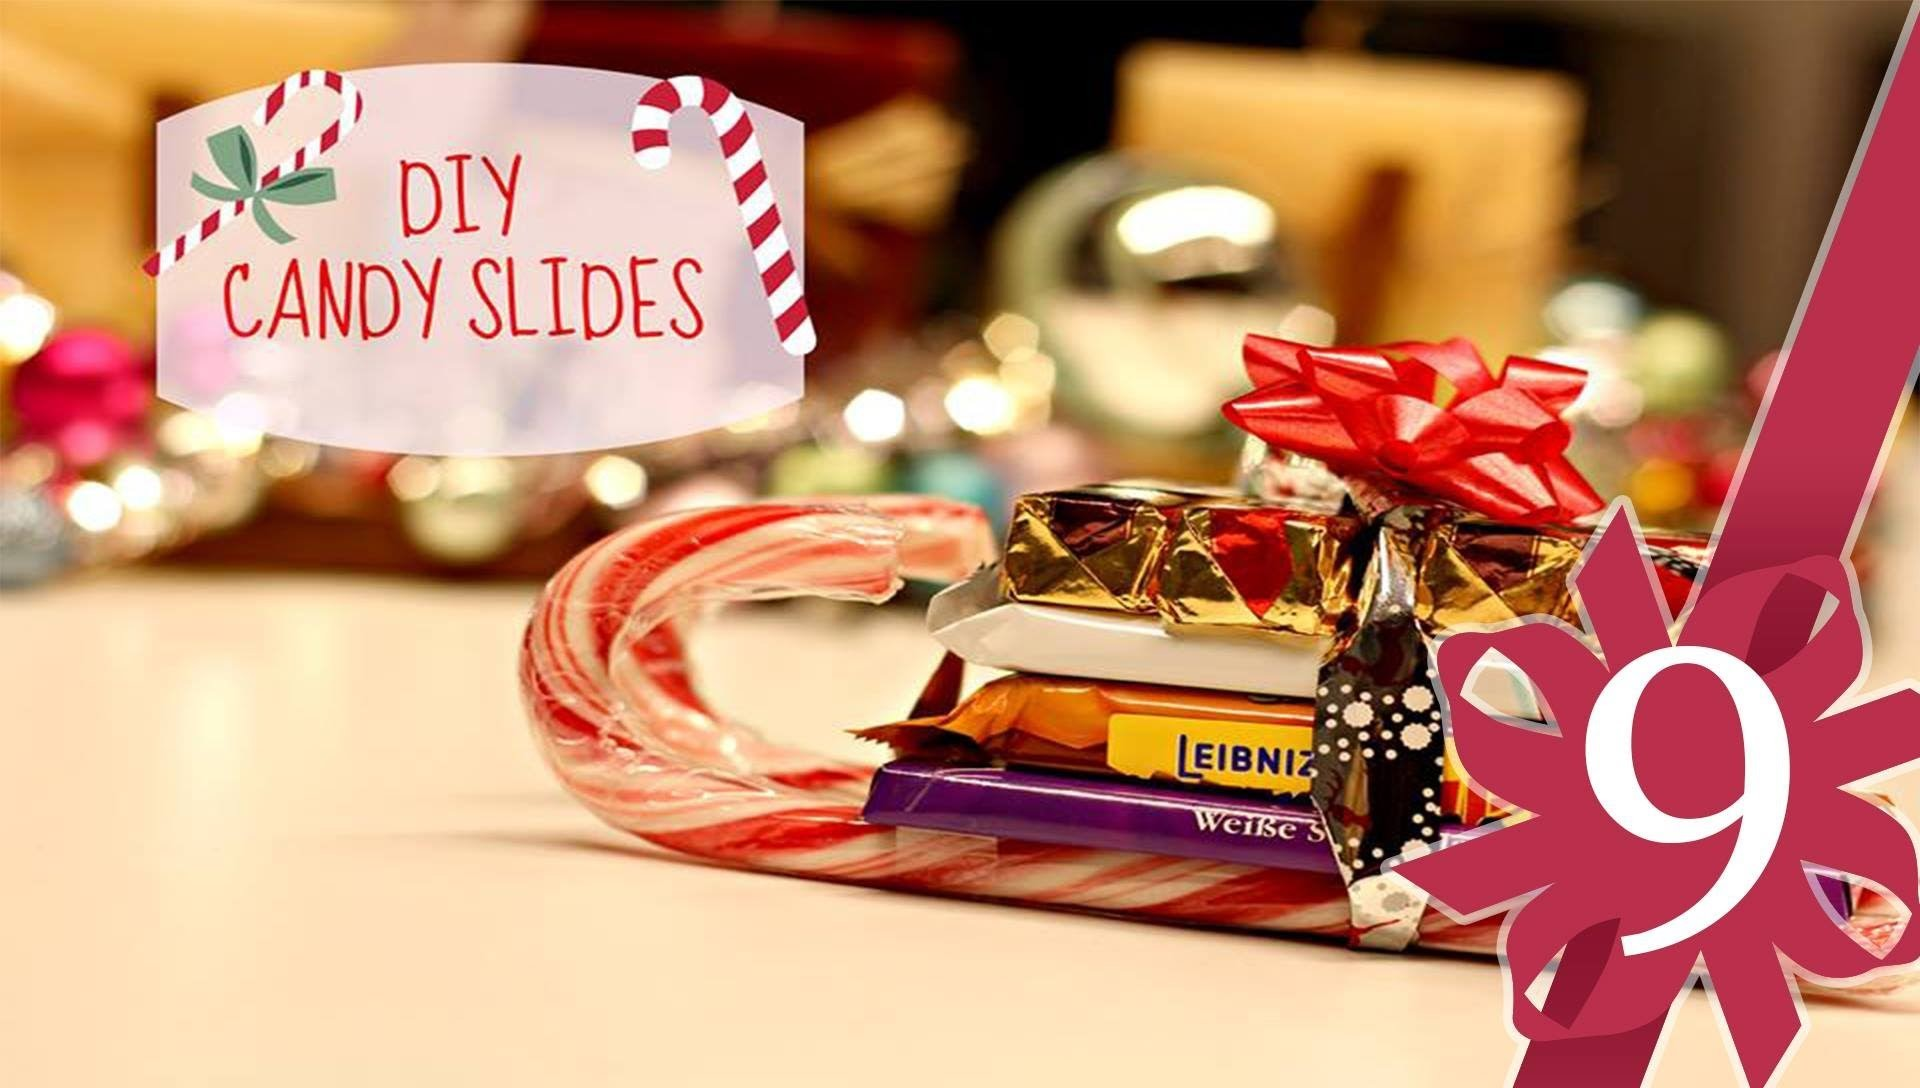 DIY Candy Sleighs - #9 Magnolia Adventskalender